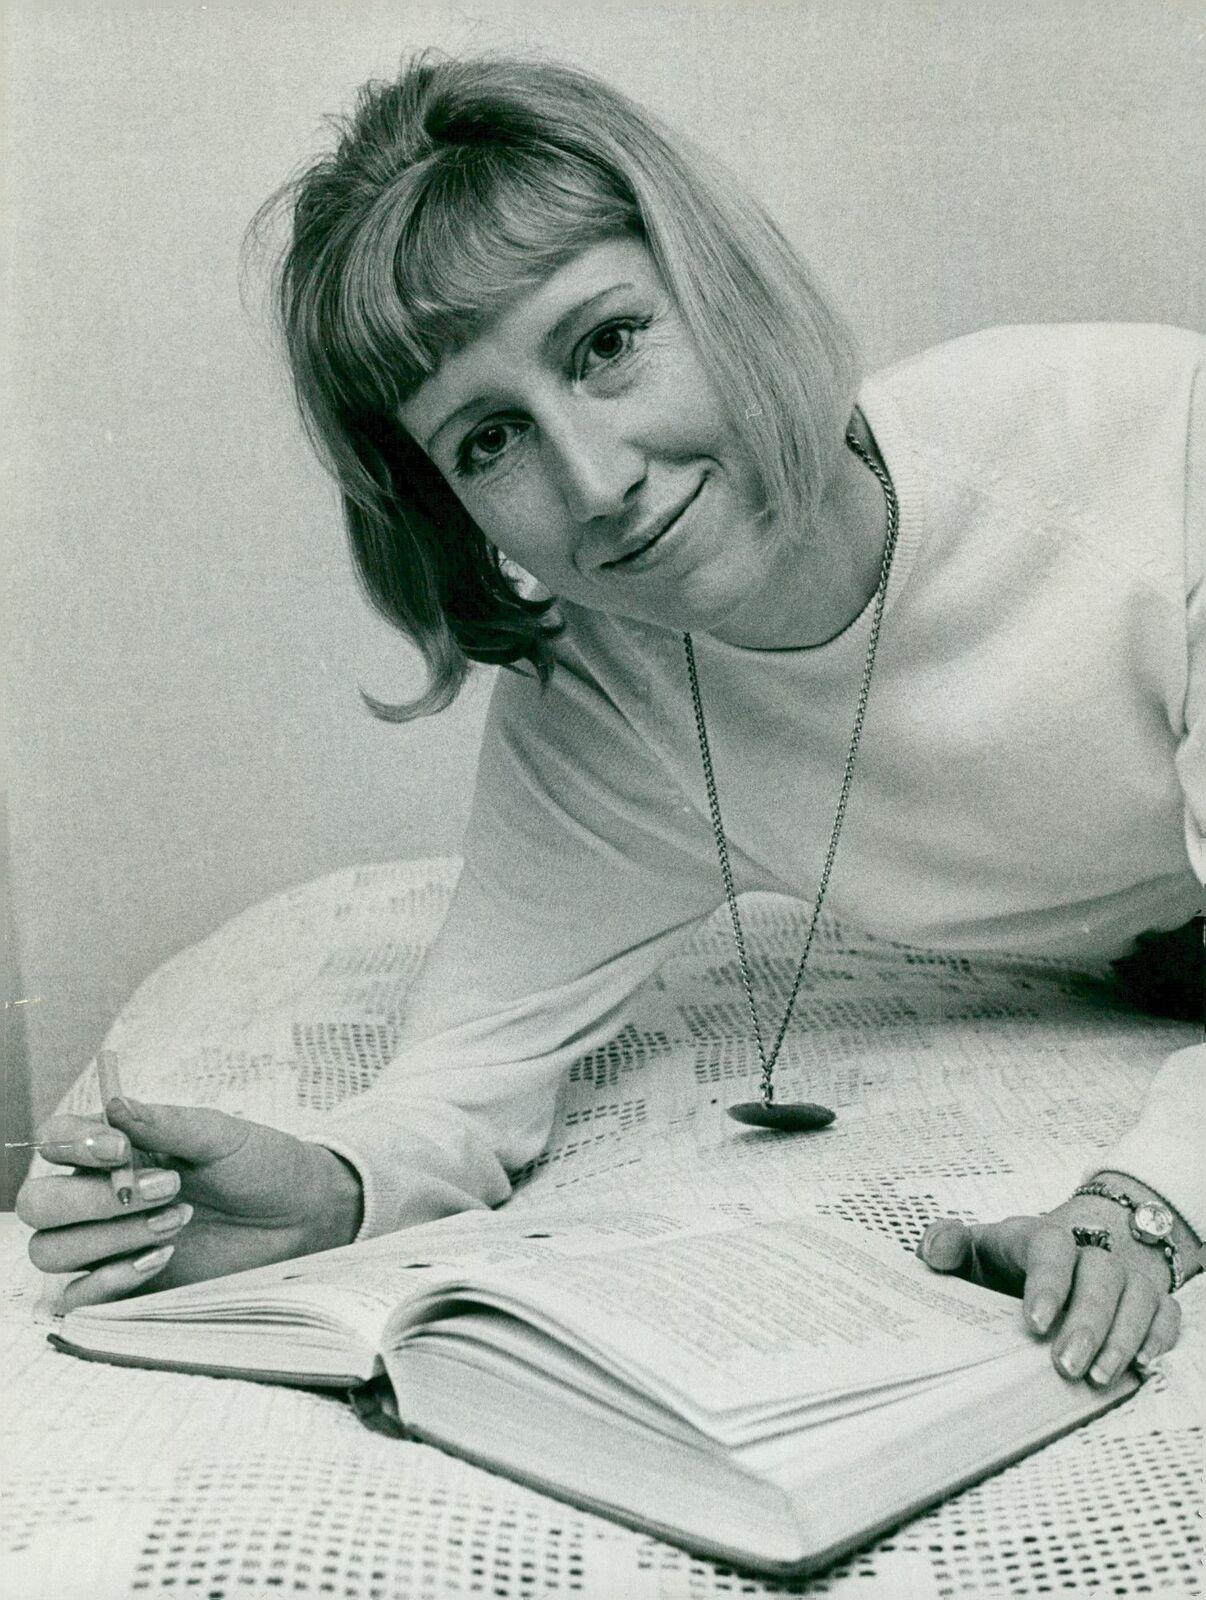 Ing-Marie Eriksson ved gennembruddet 1965.